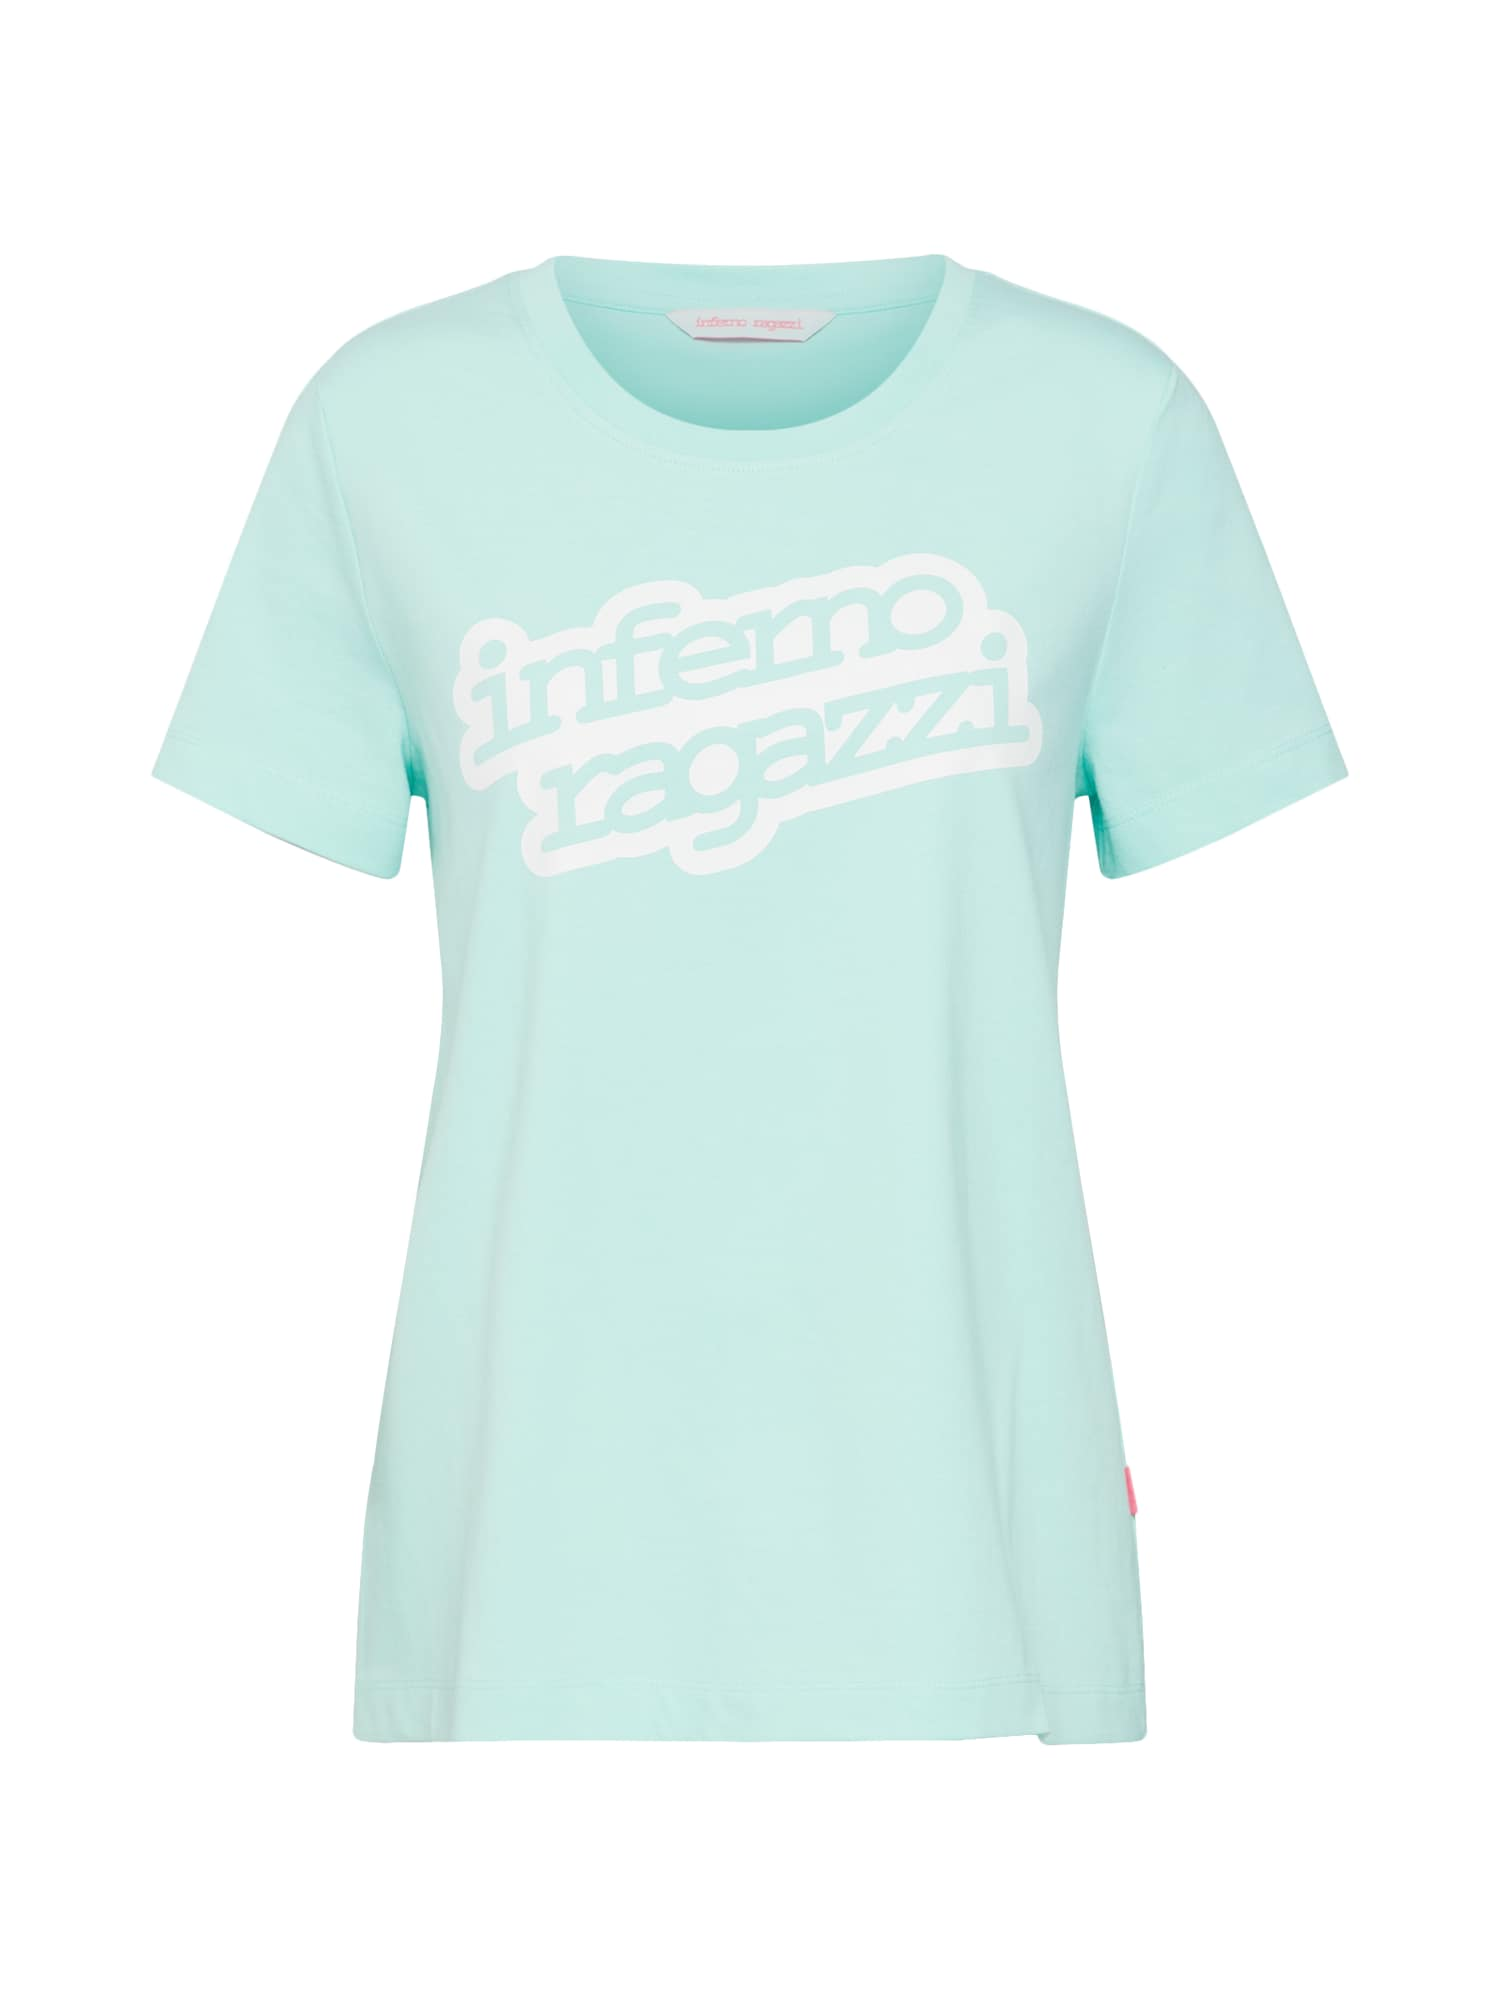 Tričko Look Up mátová bílá Inferno Ragazzi